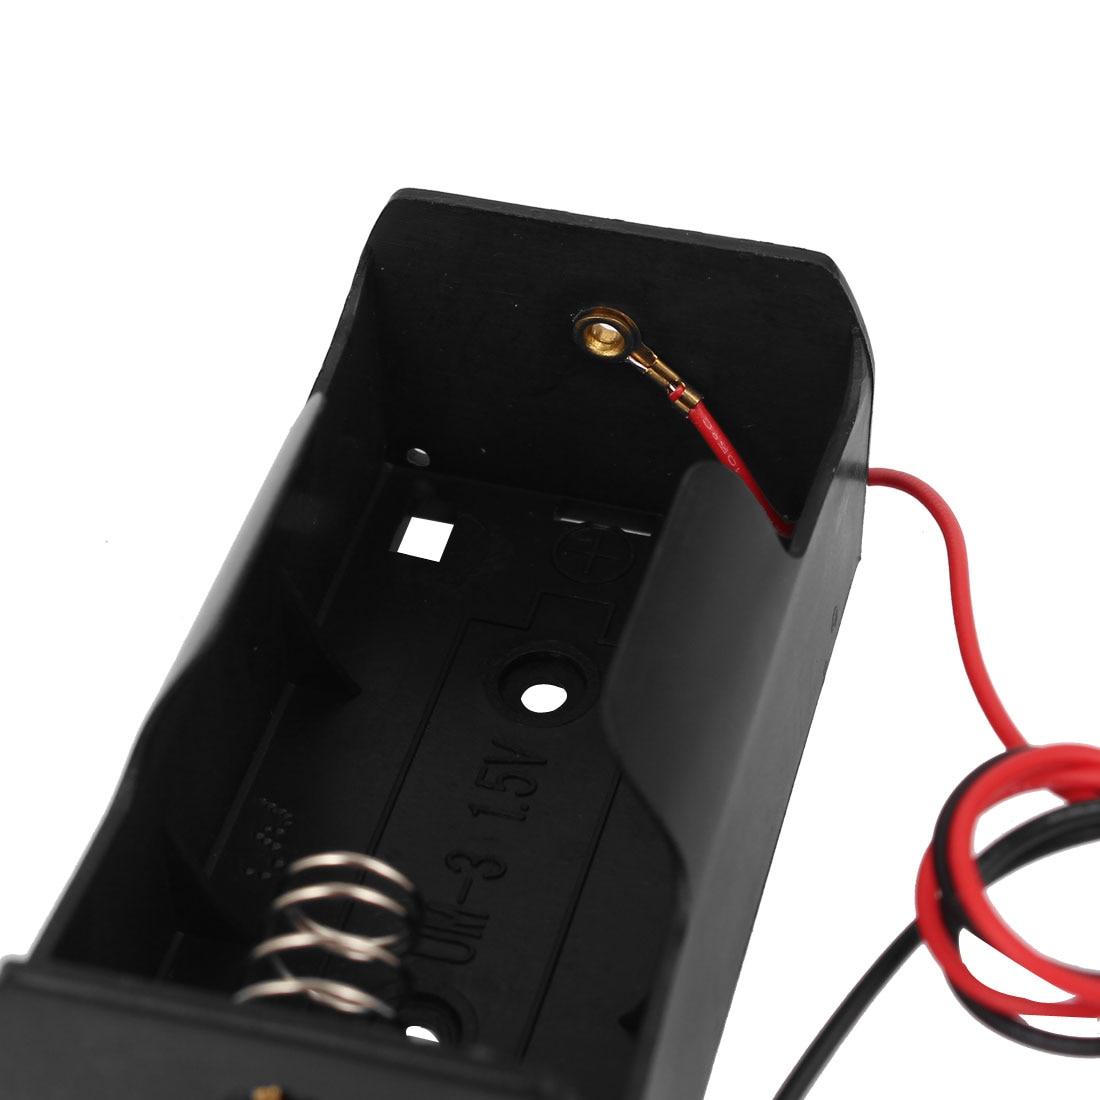 uxcell 4.5V Battery Holder Case Storage Box 3 x 1.5V D Batteries Wire Leads 10Pcs